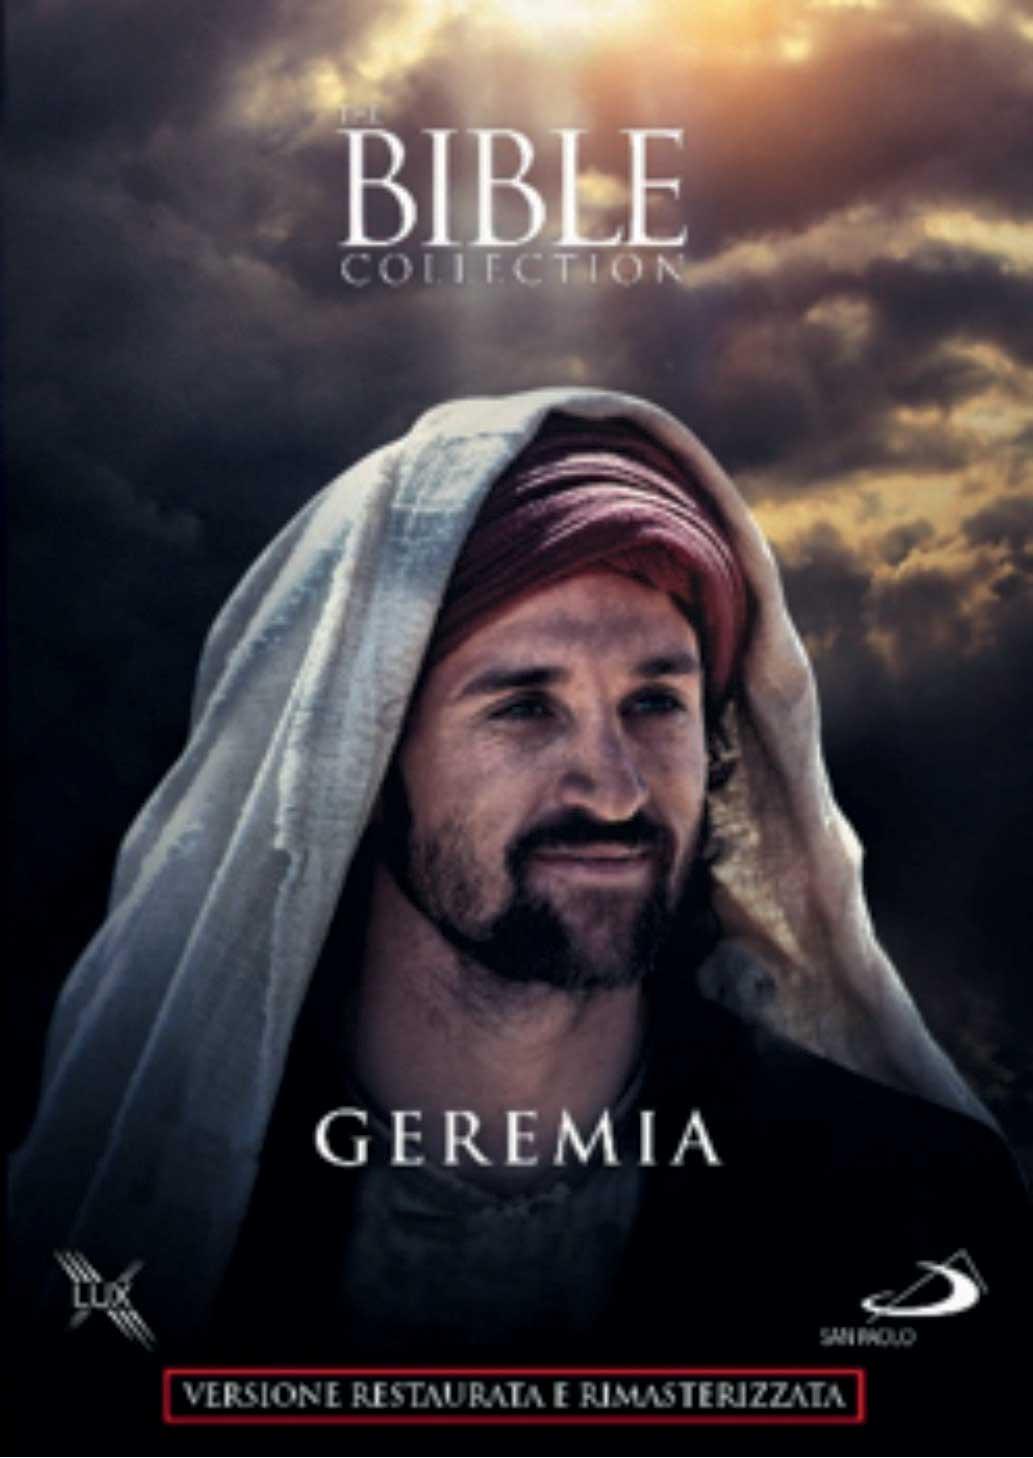 GEREMIA (DVD)